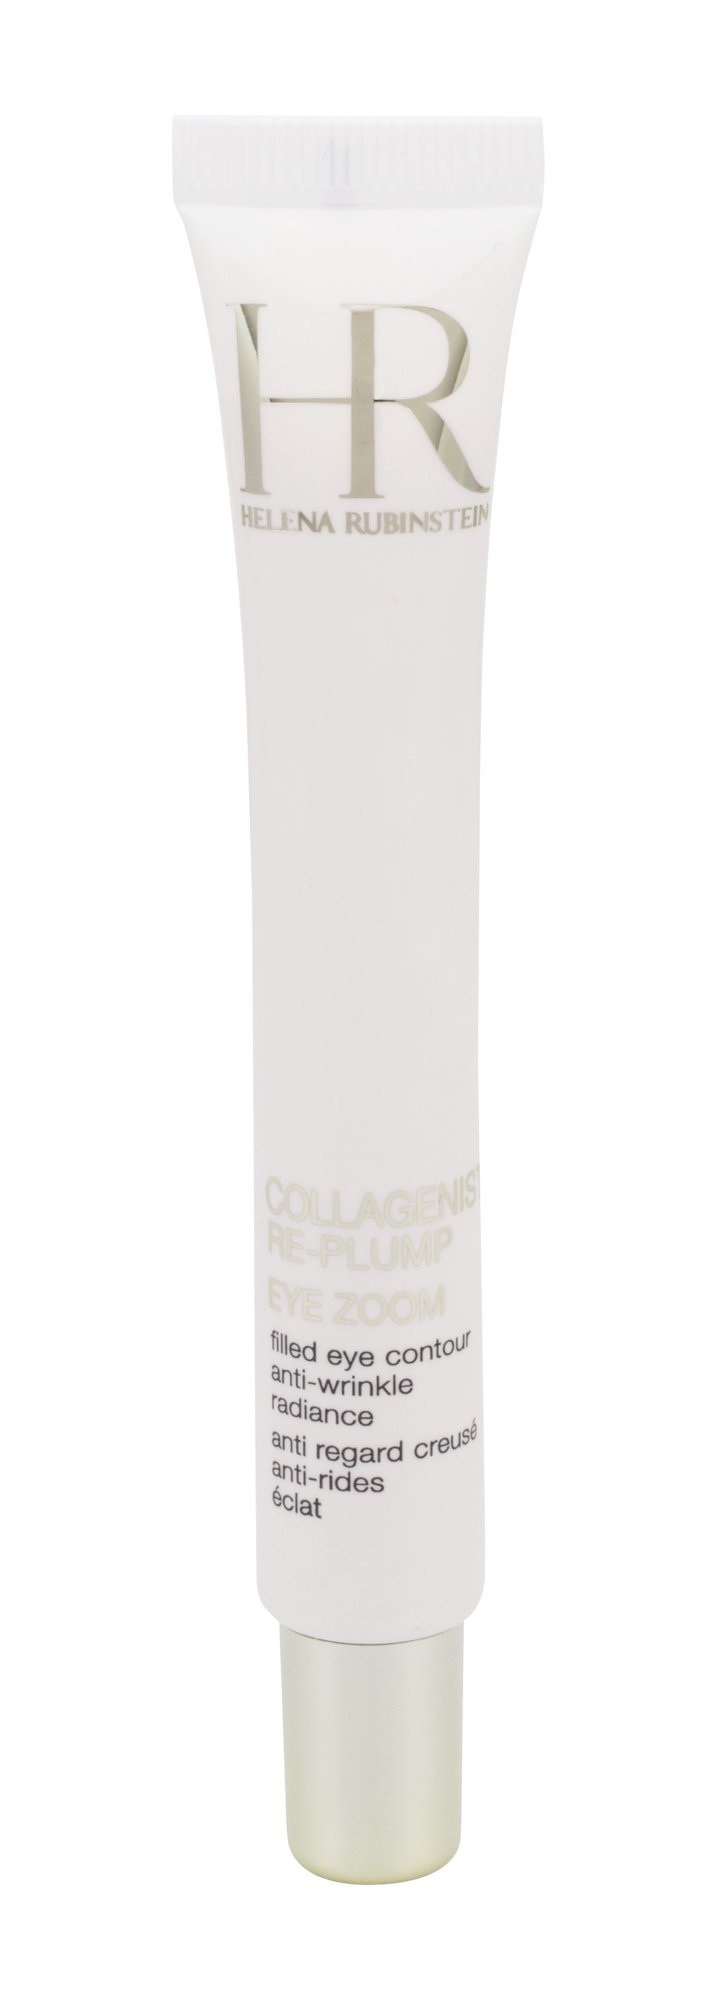 Helena Rubinstein Collagenist Re-Plump Cosmetic 15ml